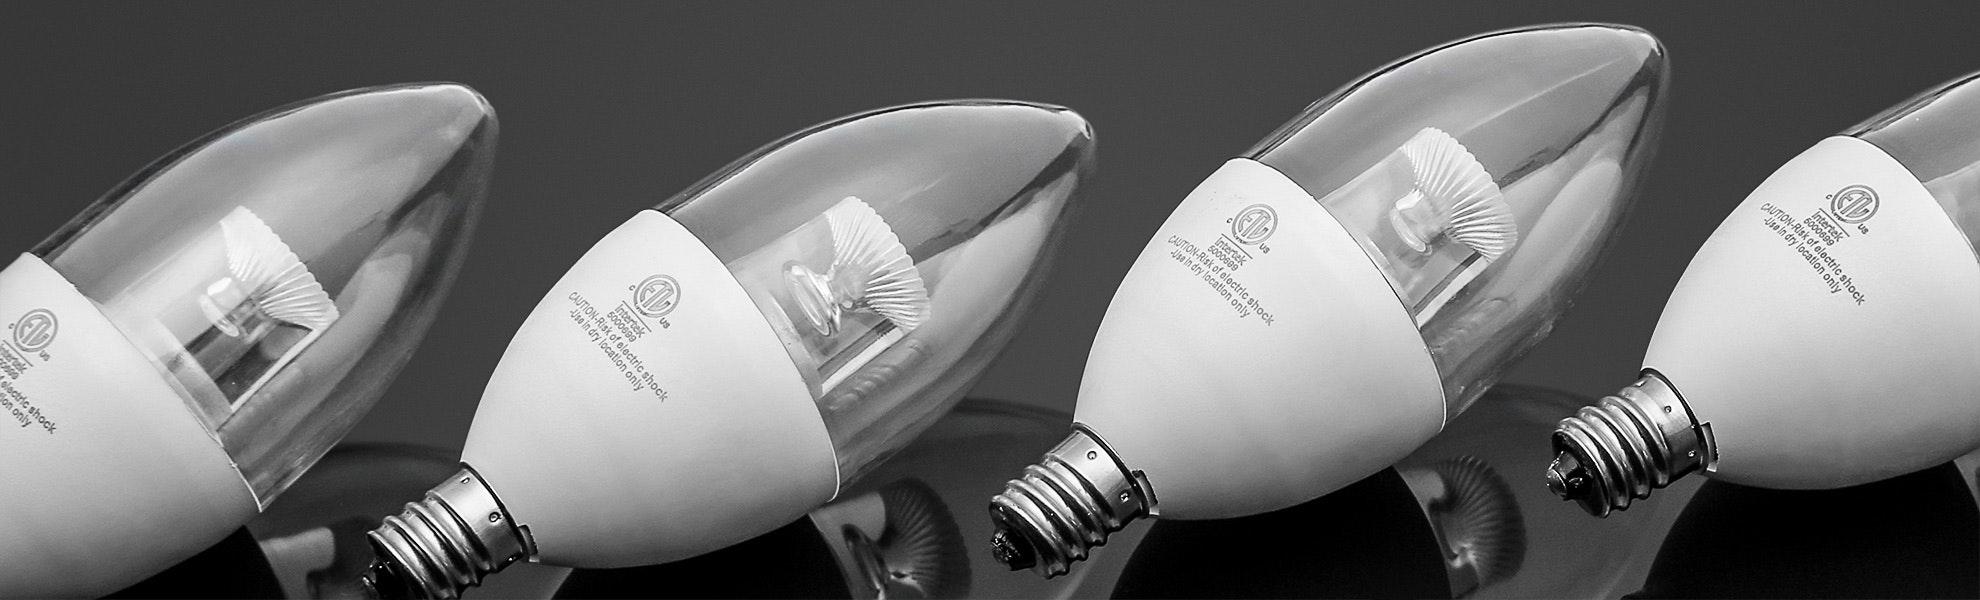 Pro HT LED Candle Light Bulbs (6-Pack)